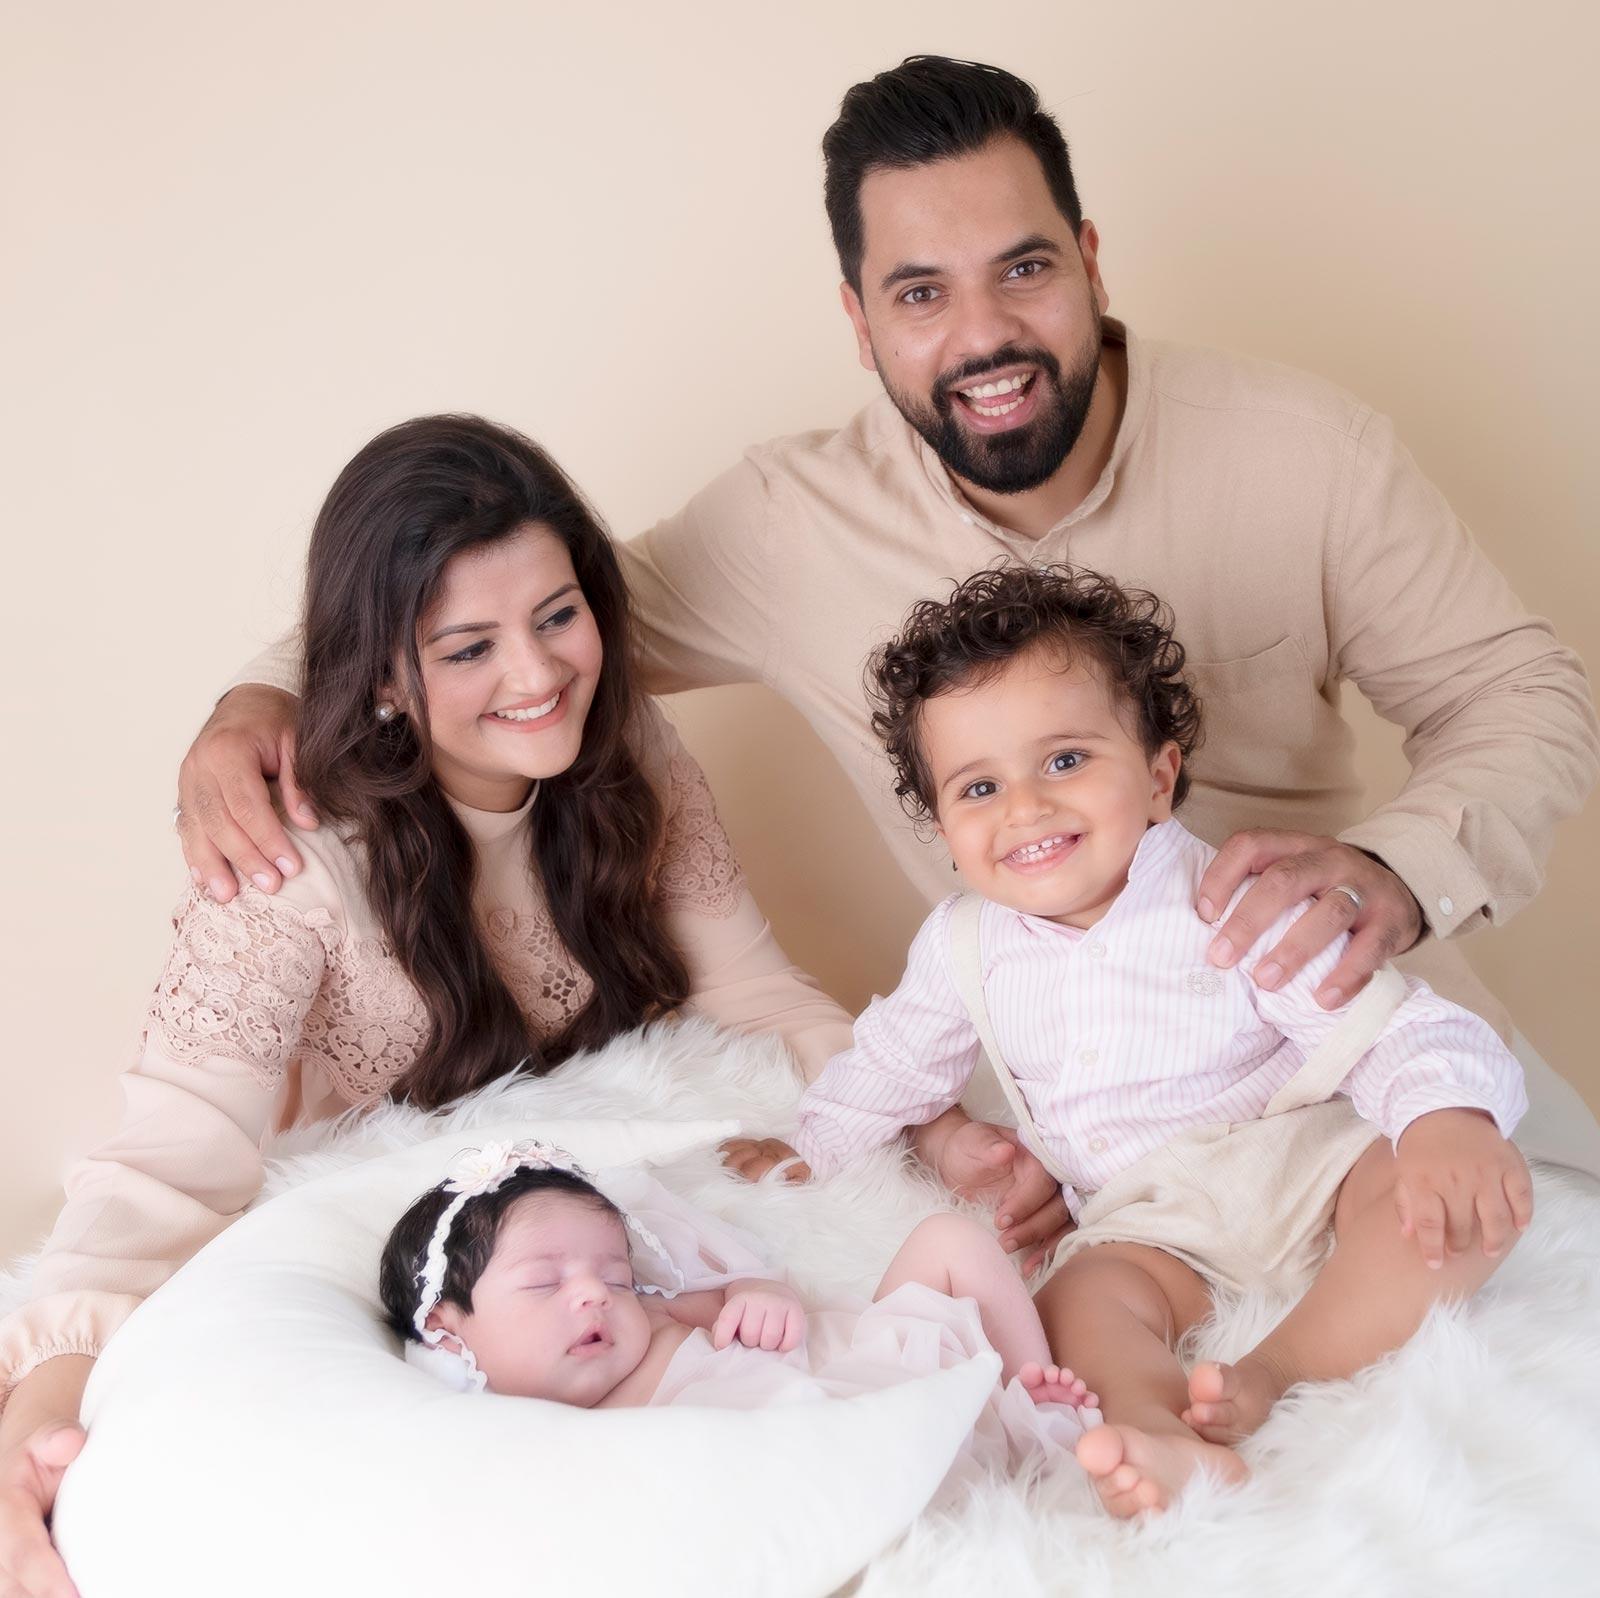 family-photography-studio-surbiton